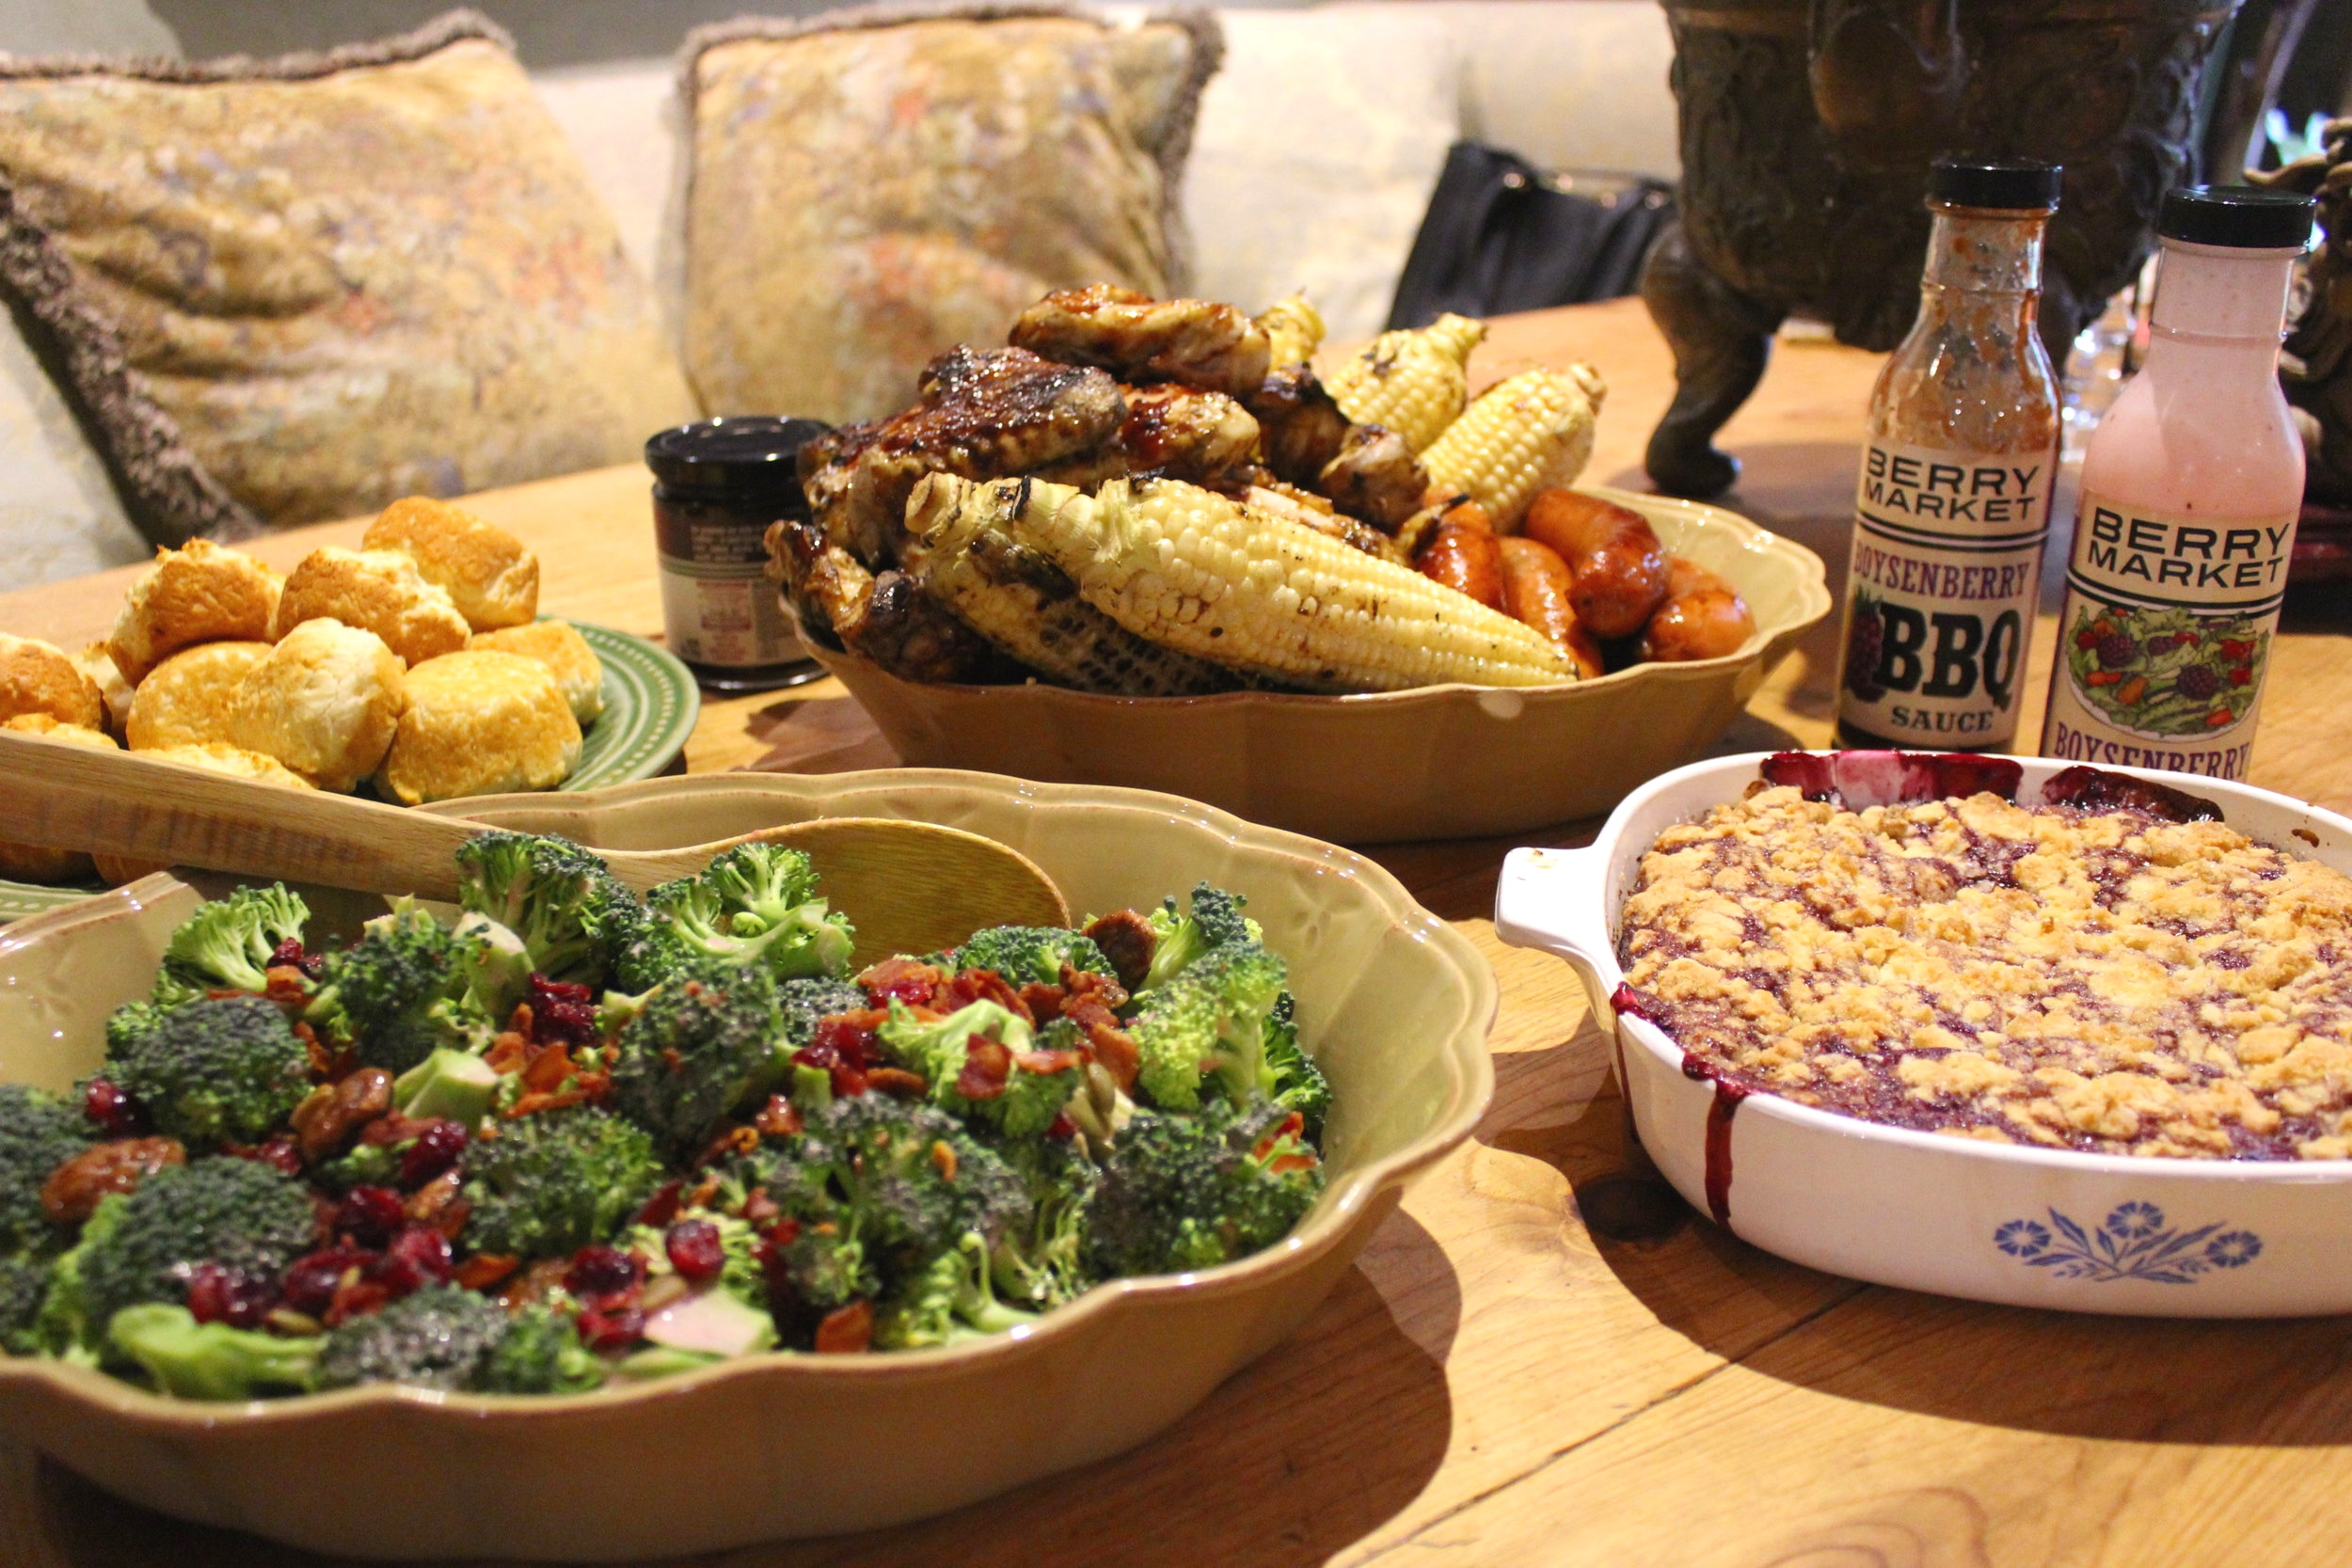 IMG_6375.jpgKnotts Boysenberry Broccoli Salad (c) Cleverly Catheryn